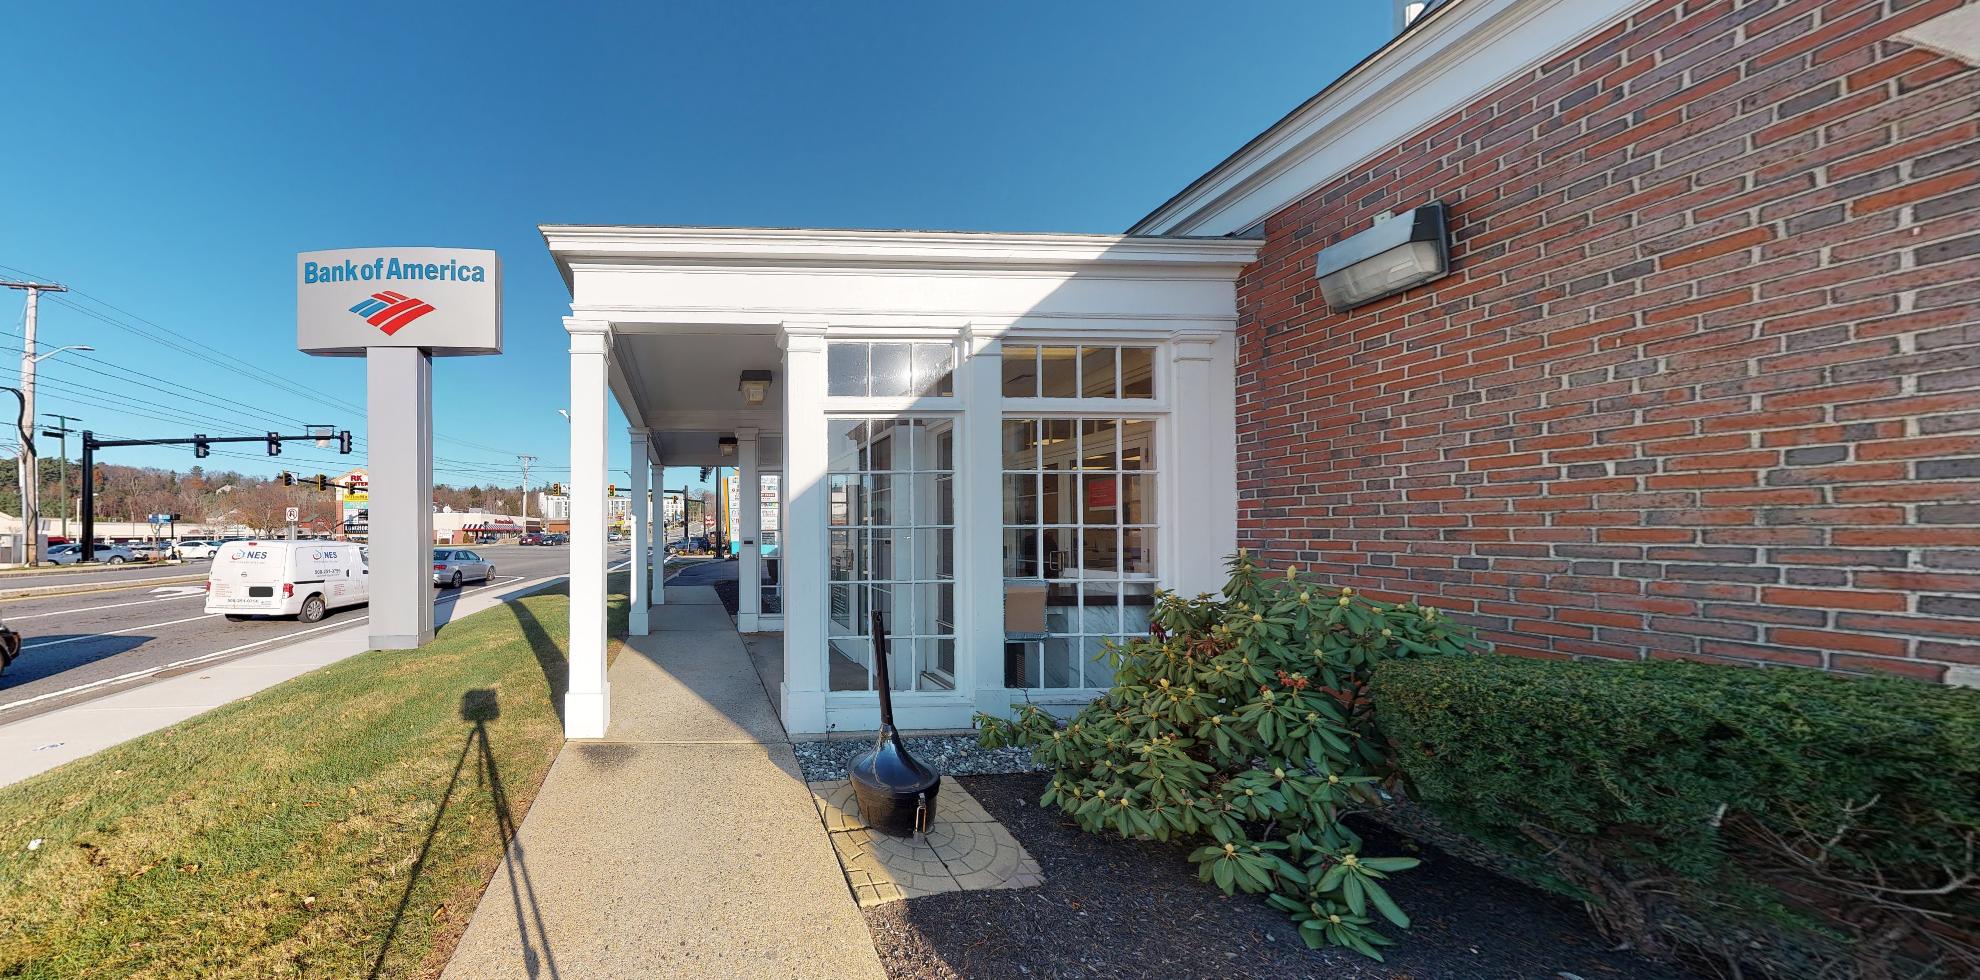 Bank of America financial center with drive-thru ATM   190 Boston Post Rd W, Marlborough, MA 01752